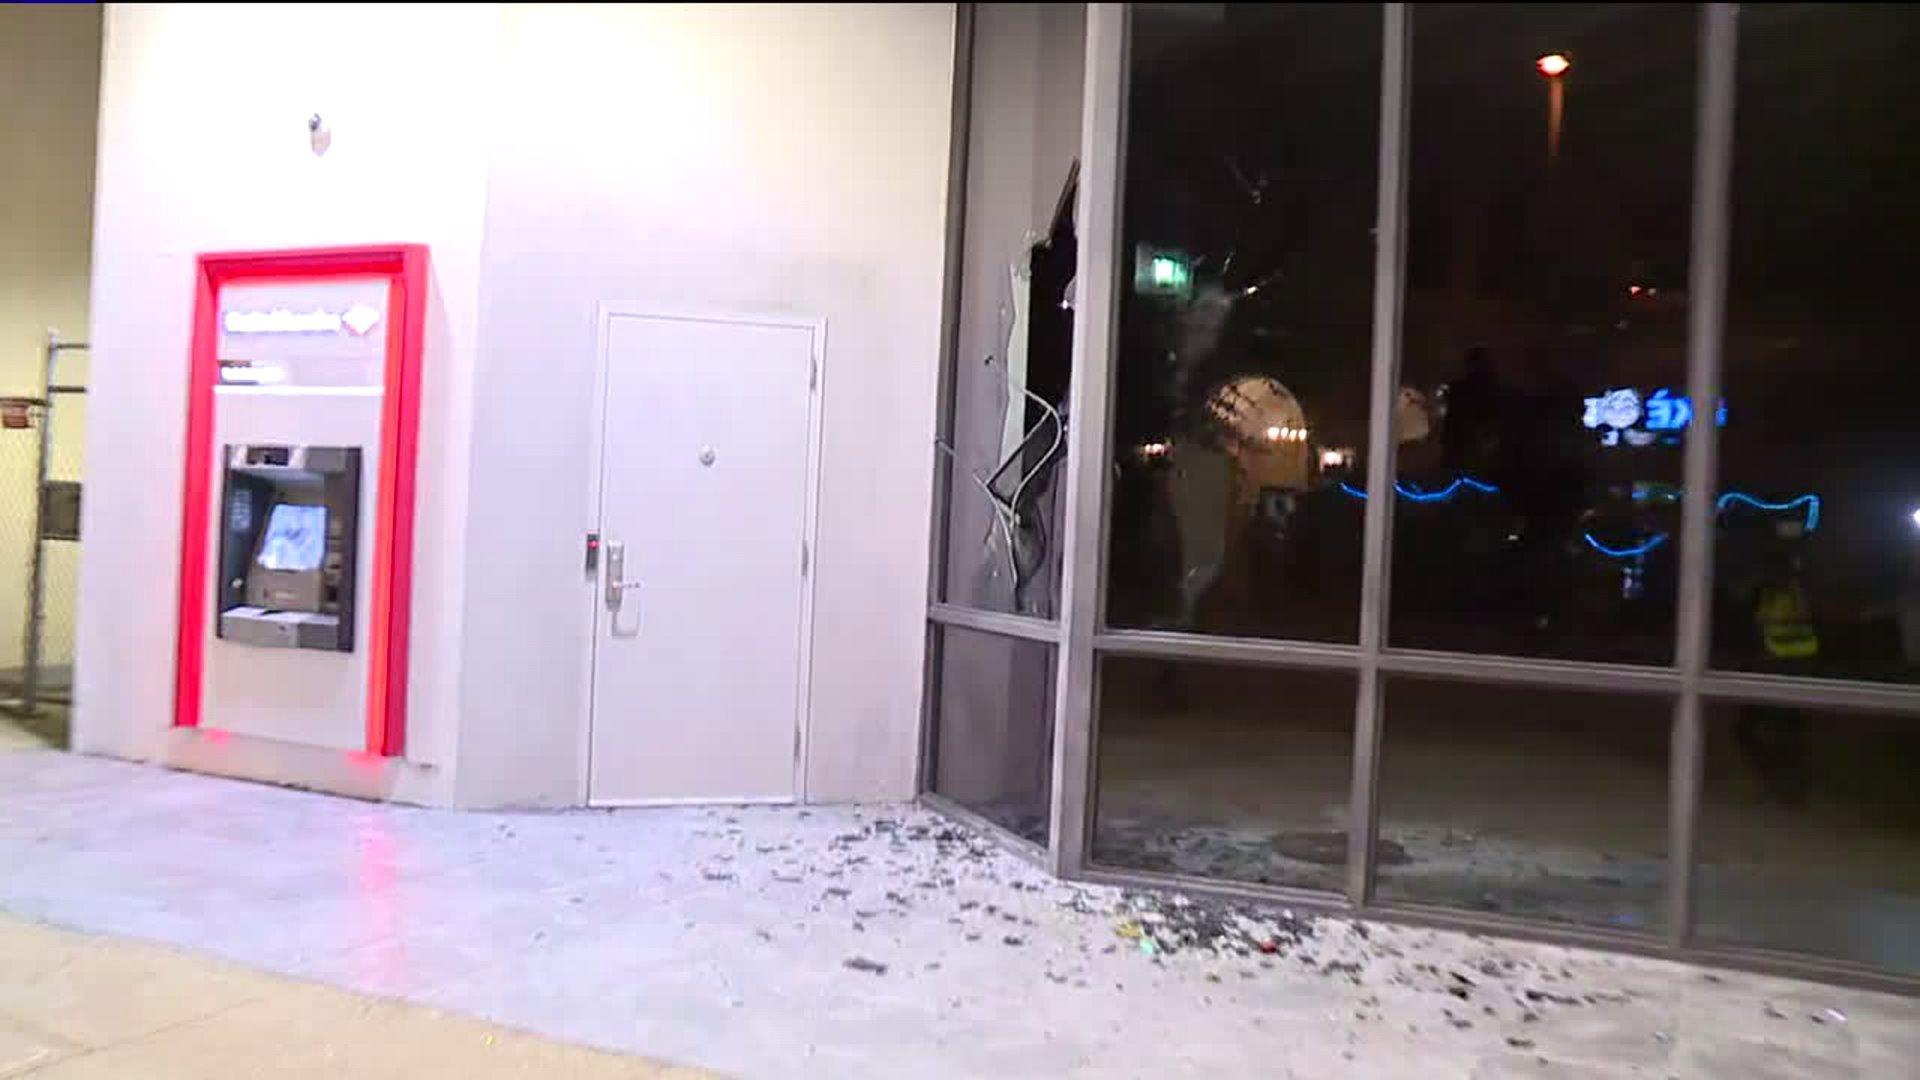 Protestors smash windows, litter streets with trash bins in downtown Greensboro